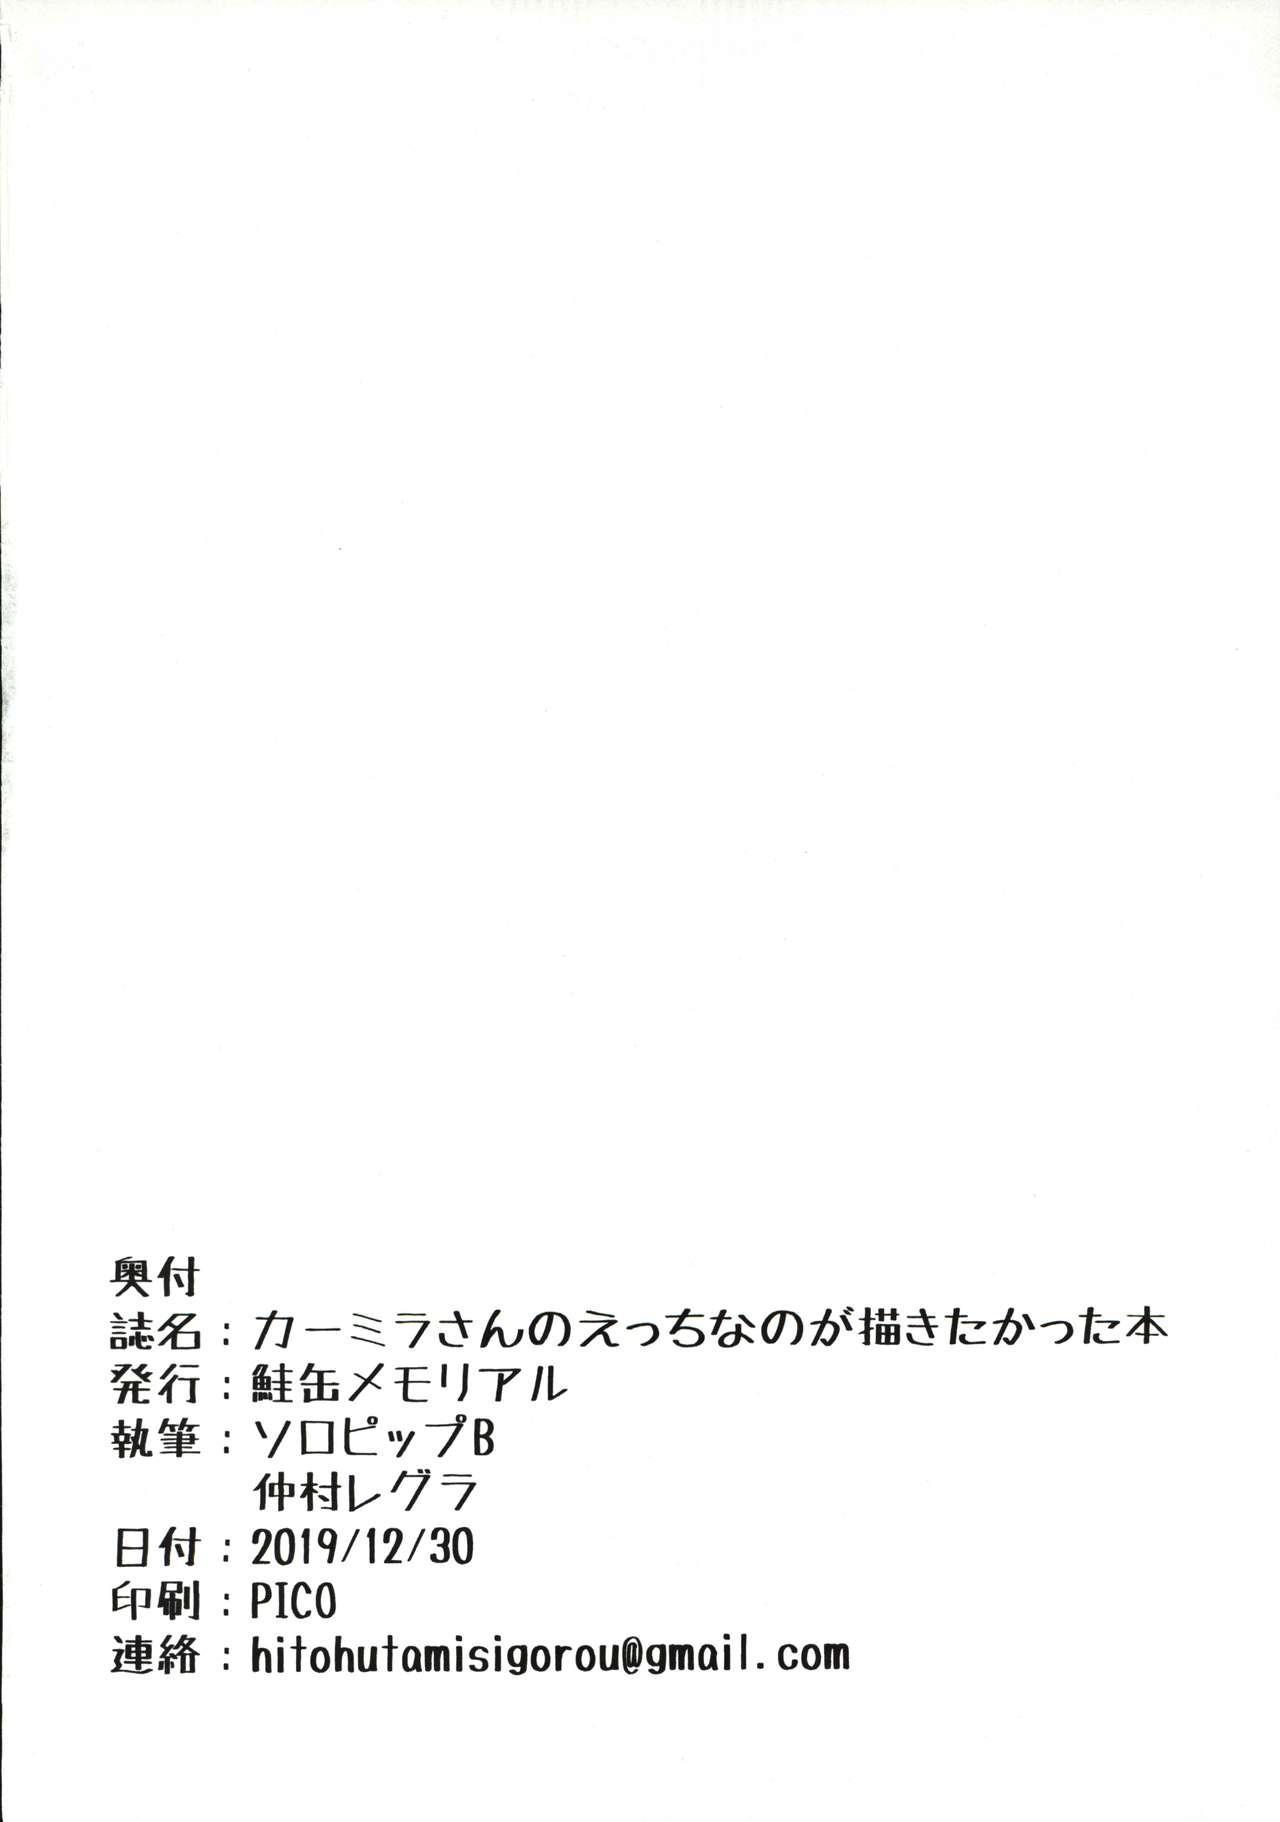 Carmilla-san no Ecchi na no ga Kakitakatta Hon 28